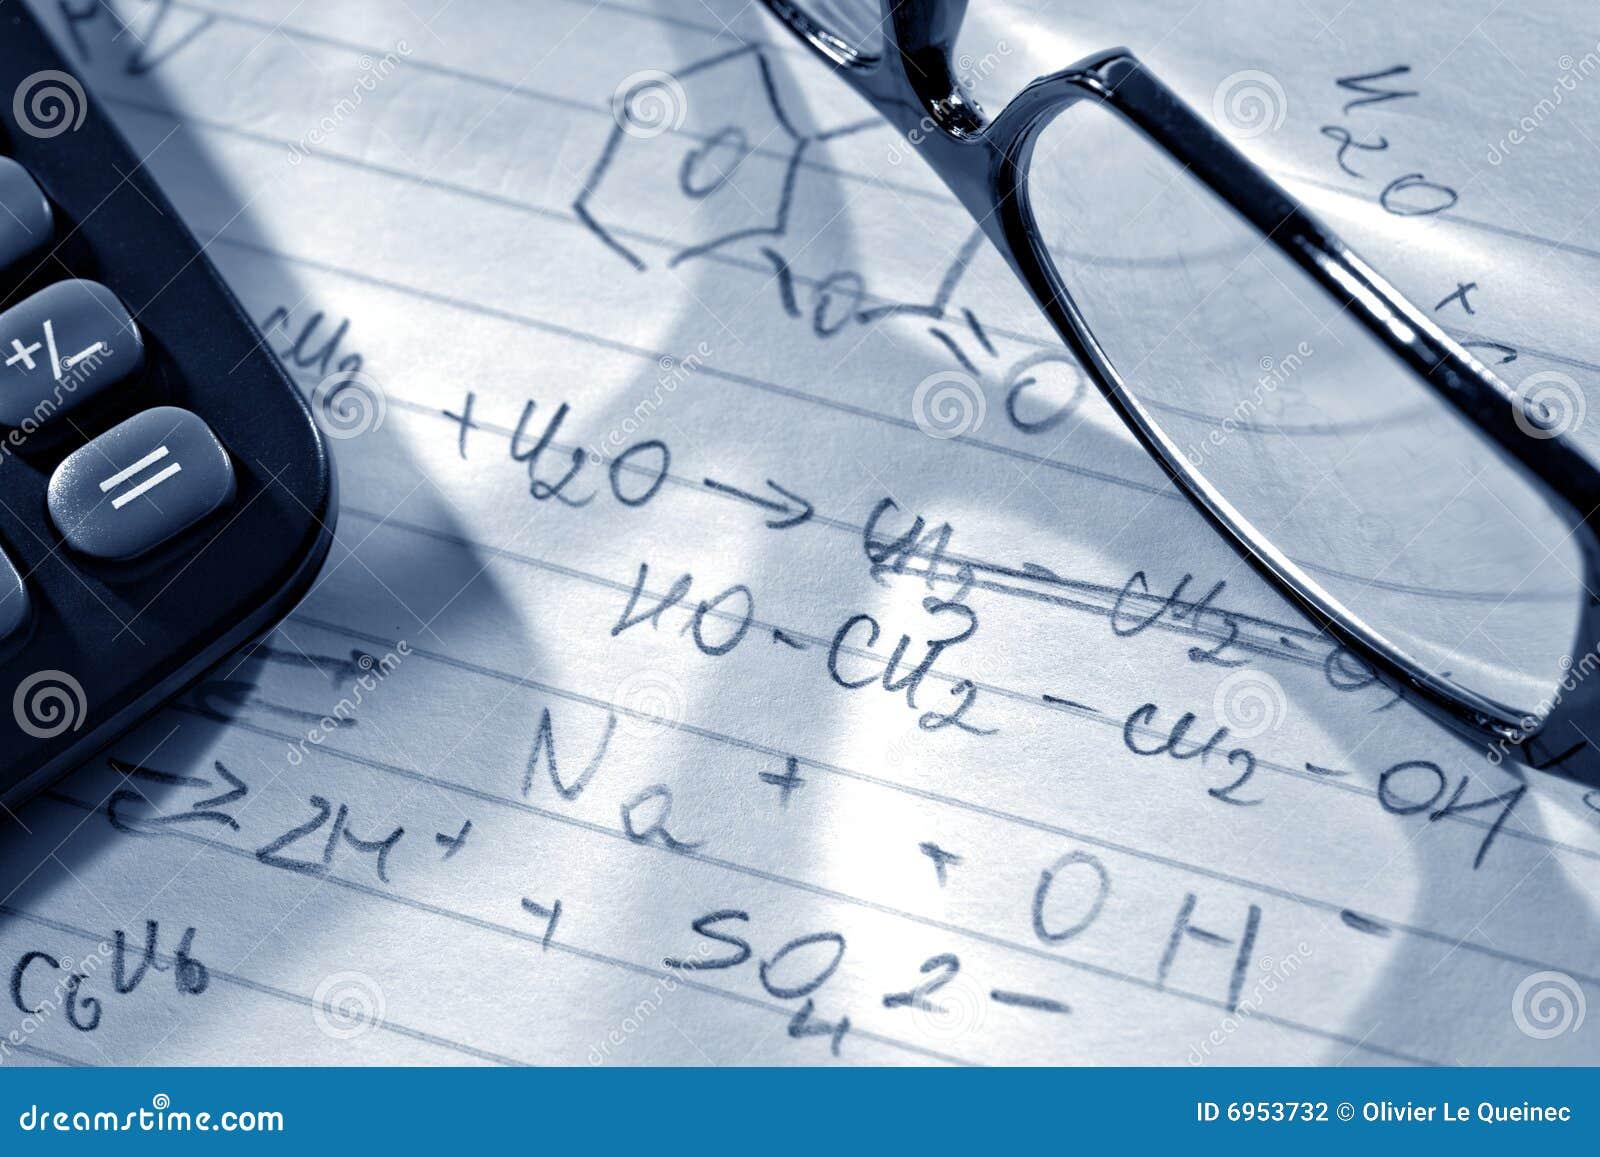 наука исследования лаборатории формул химии